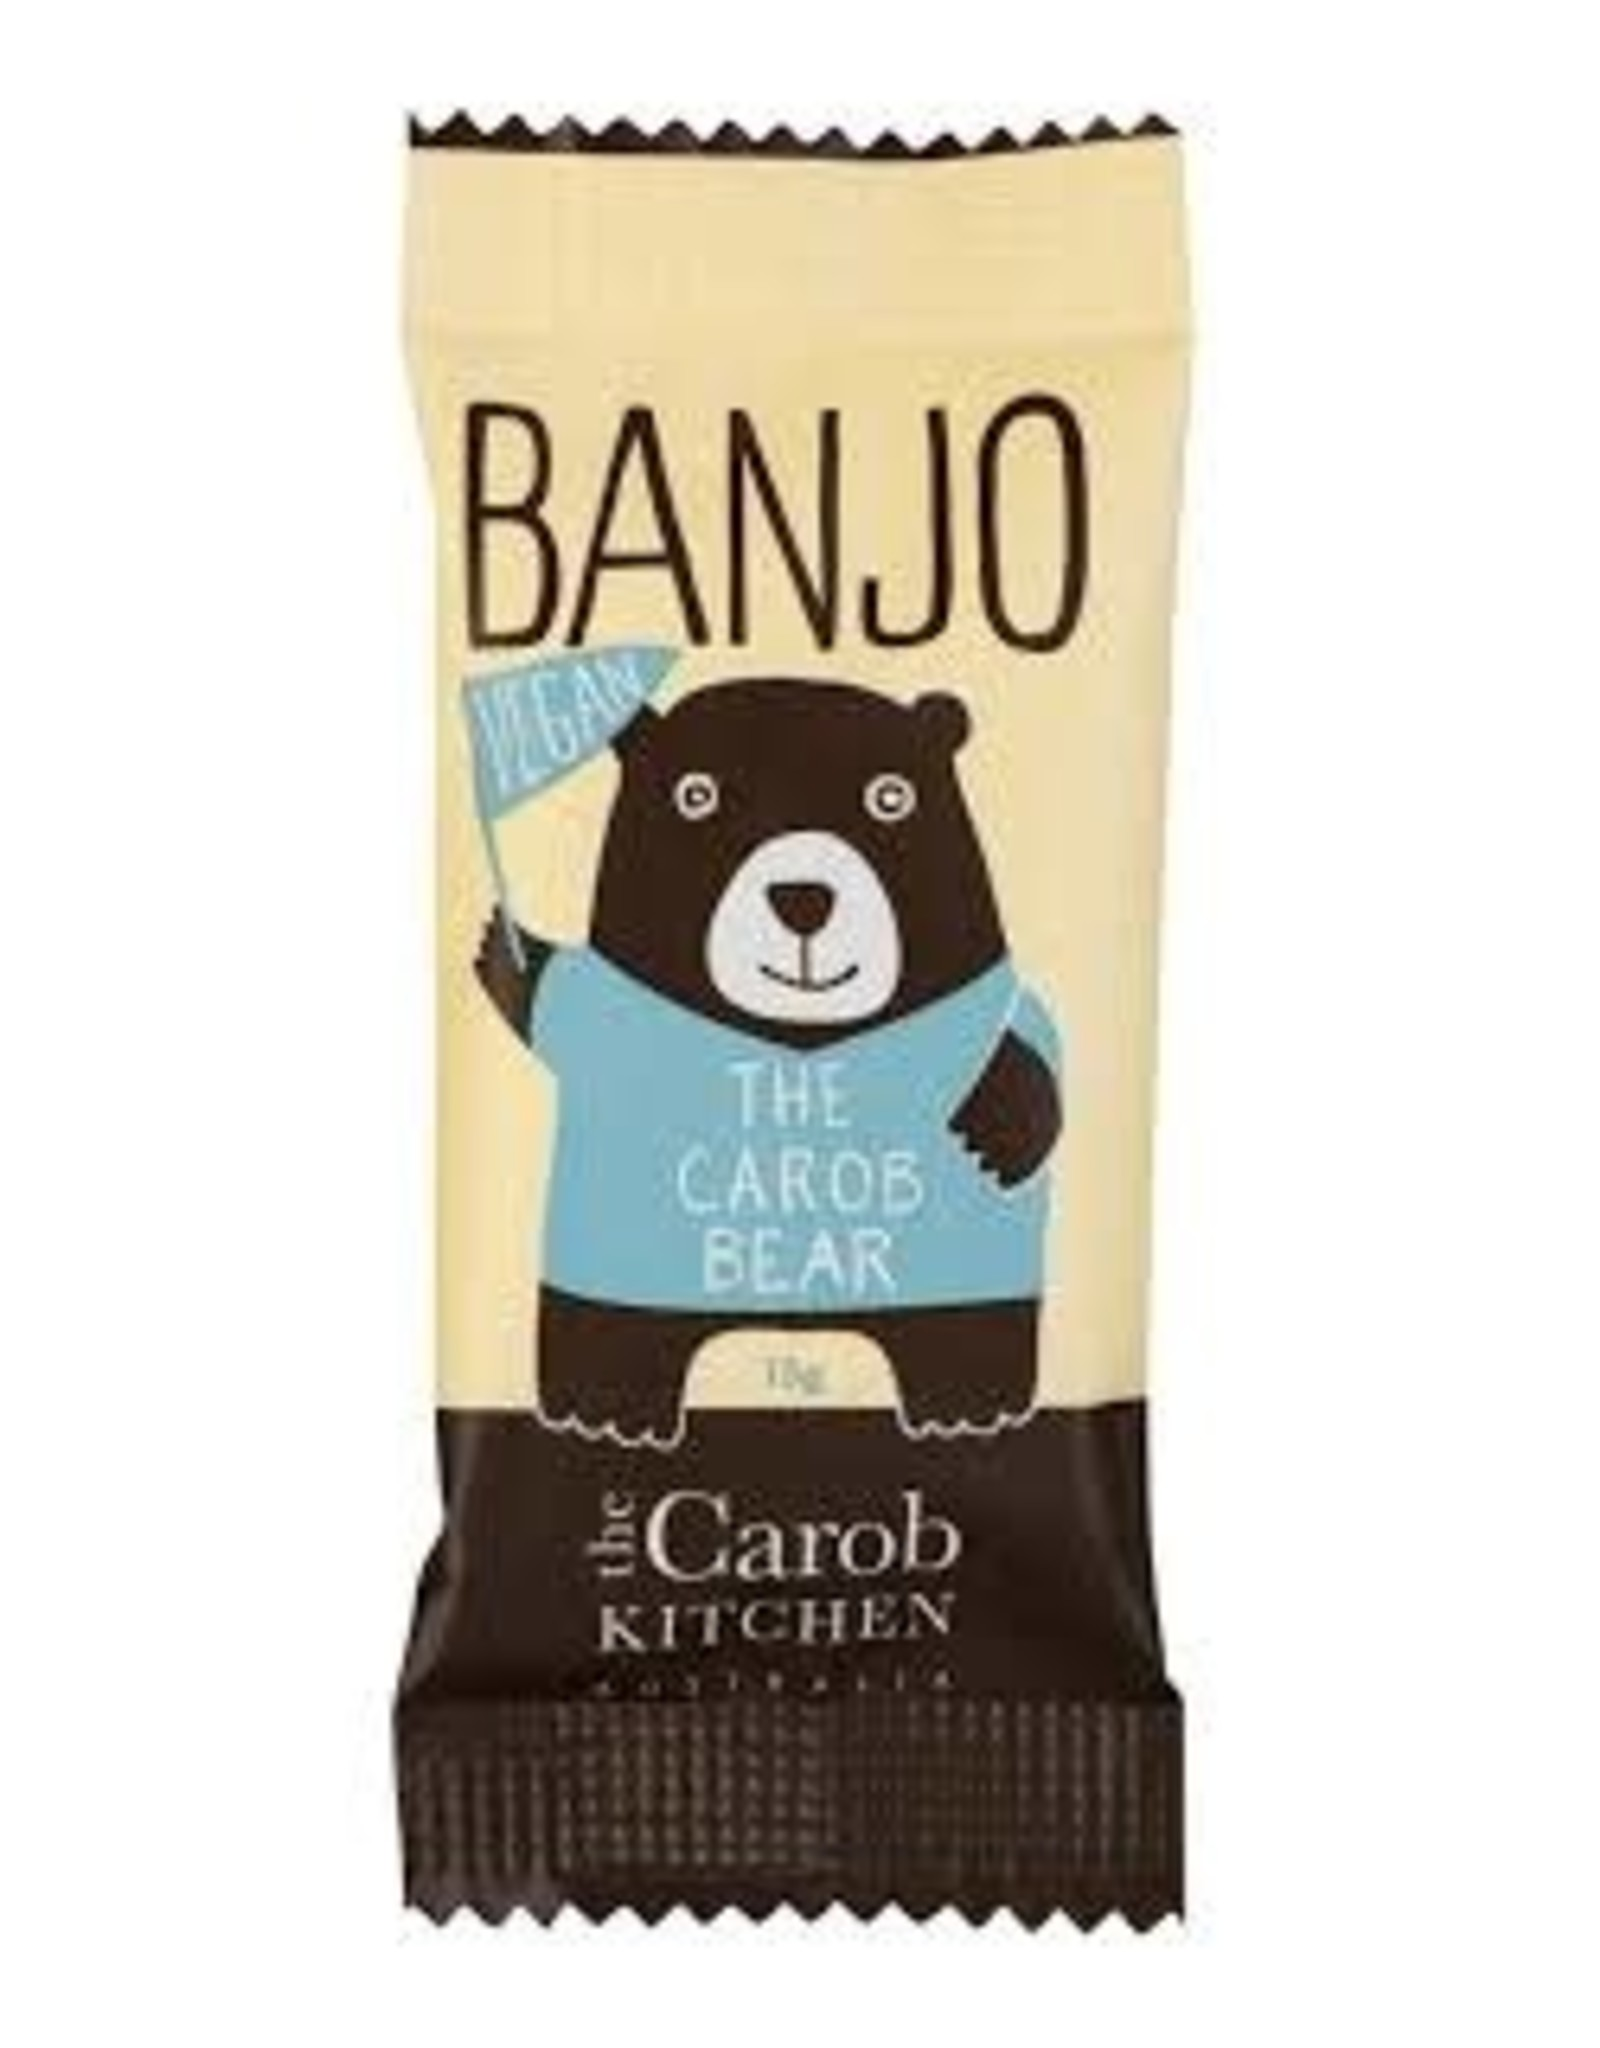 The Carob Kitchen Banjo Bear Vegan 15g